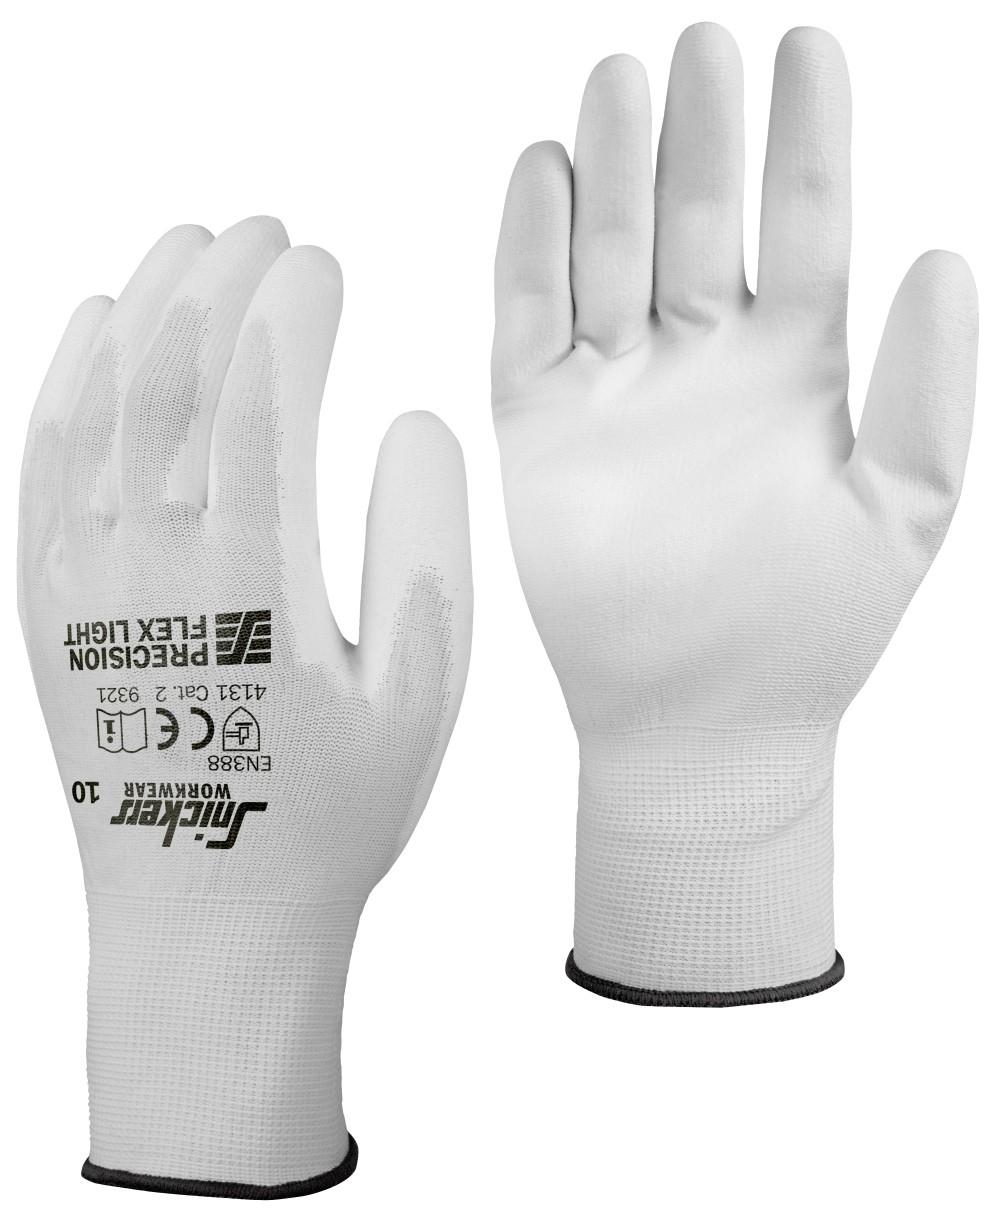 Precision Flex Light Gloves